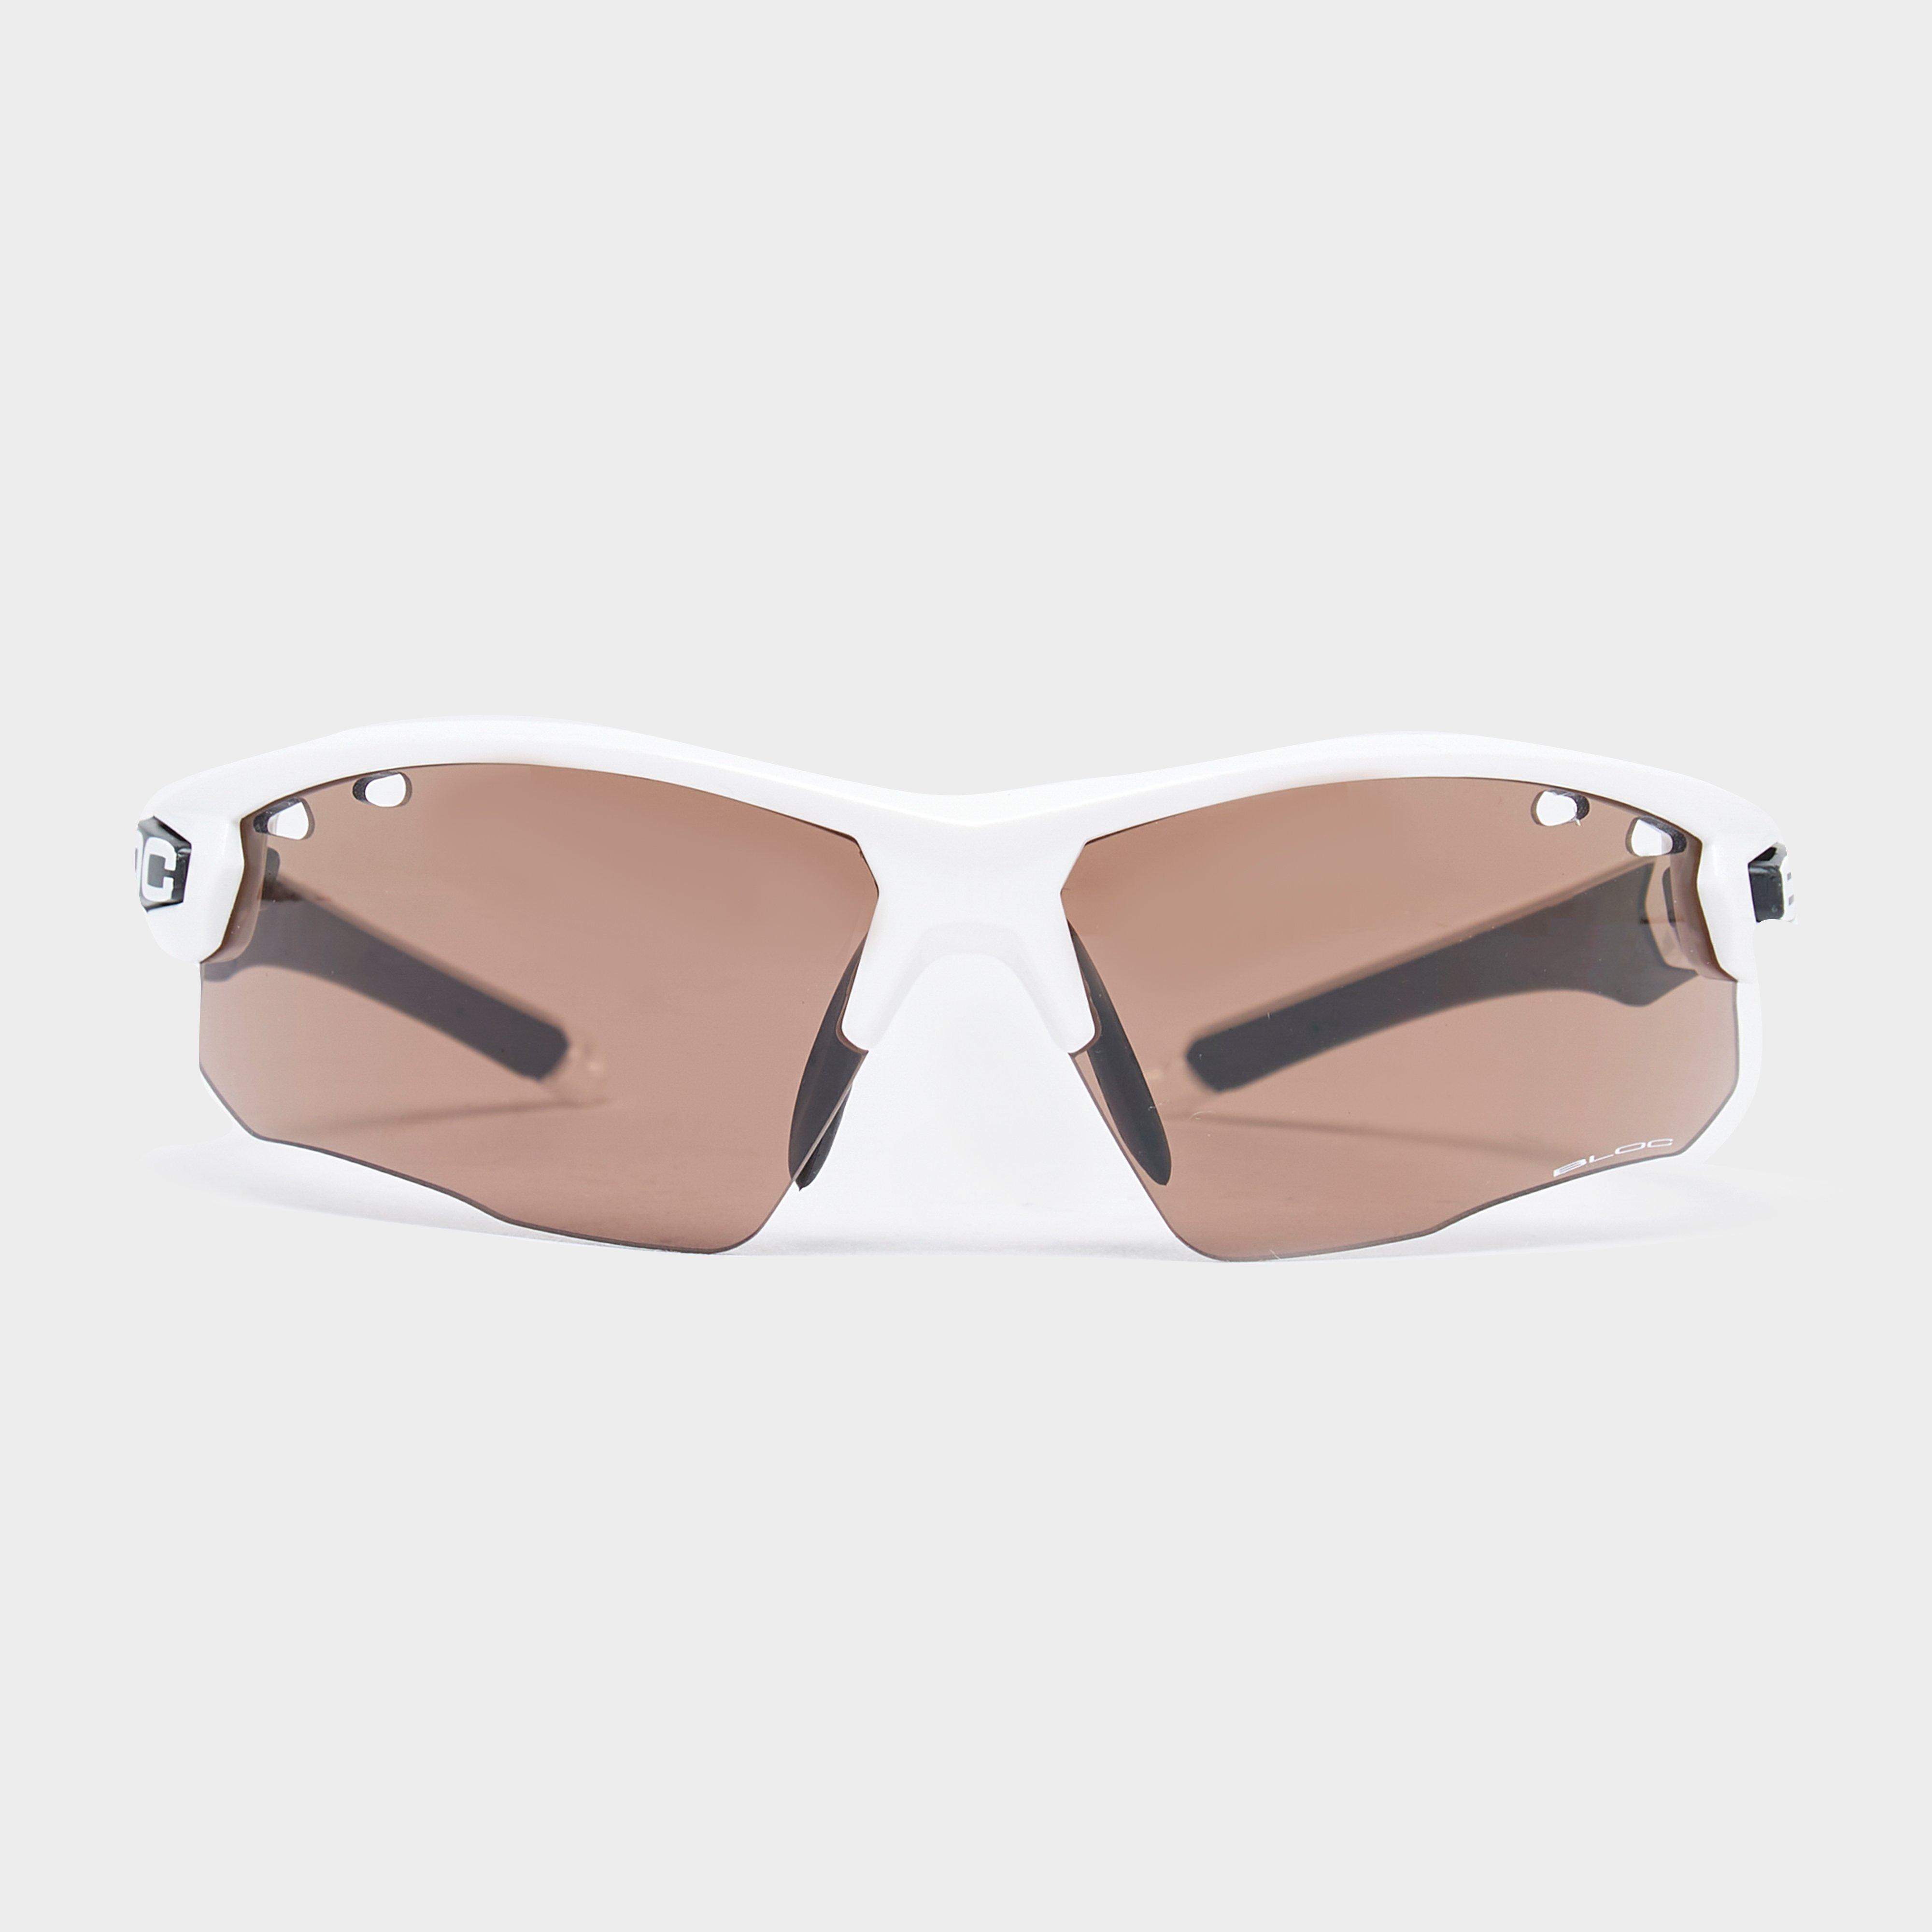 Bloc Ttian Xr630 Sunglasses - White/Wht/Multi, White